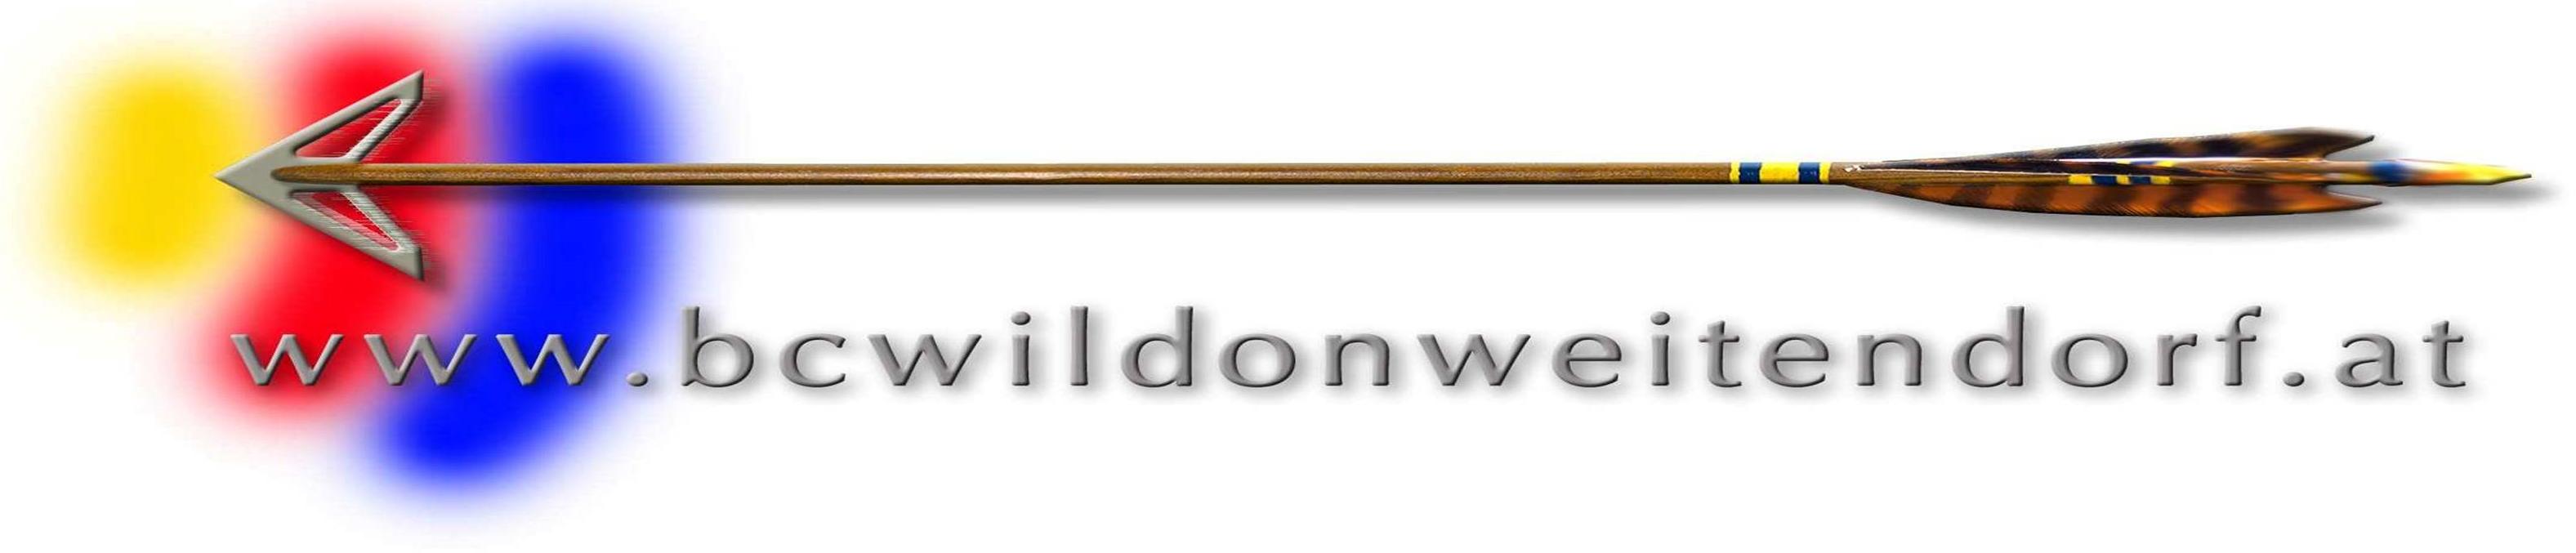 BC Wildon-Weitendorf